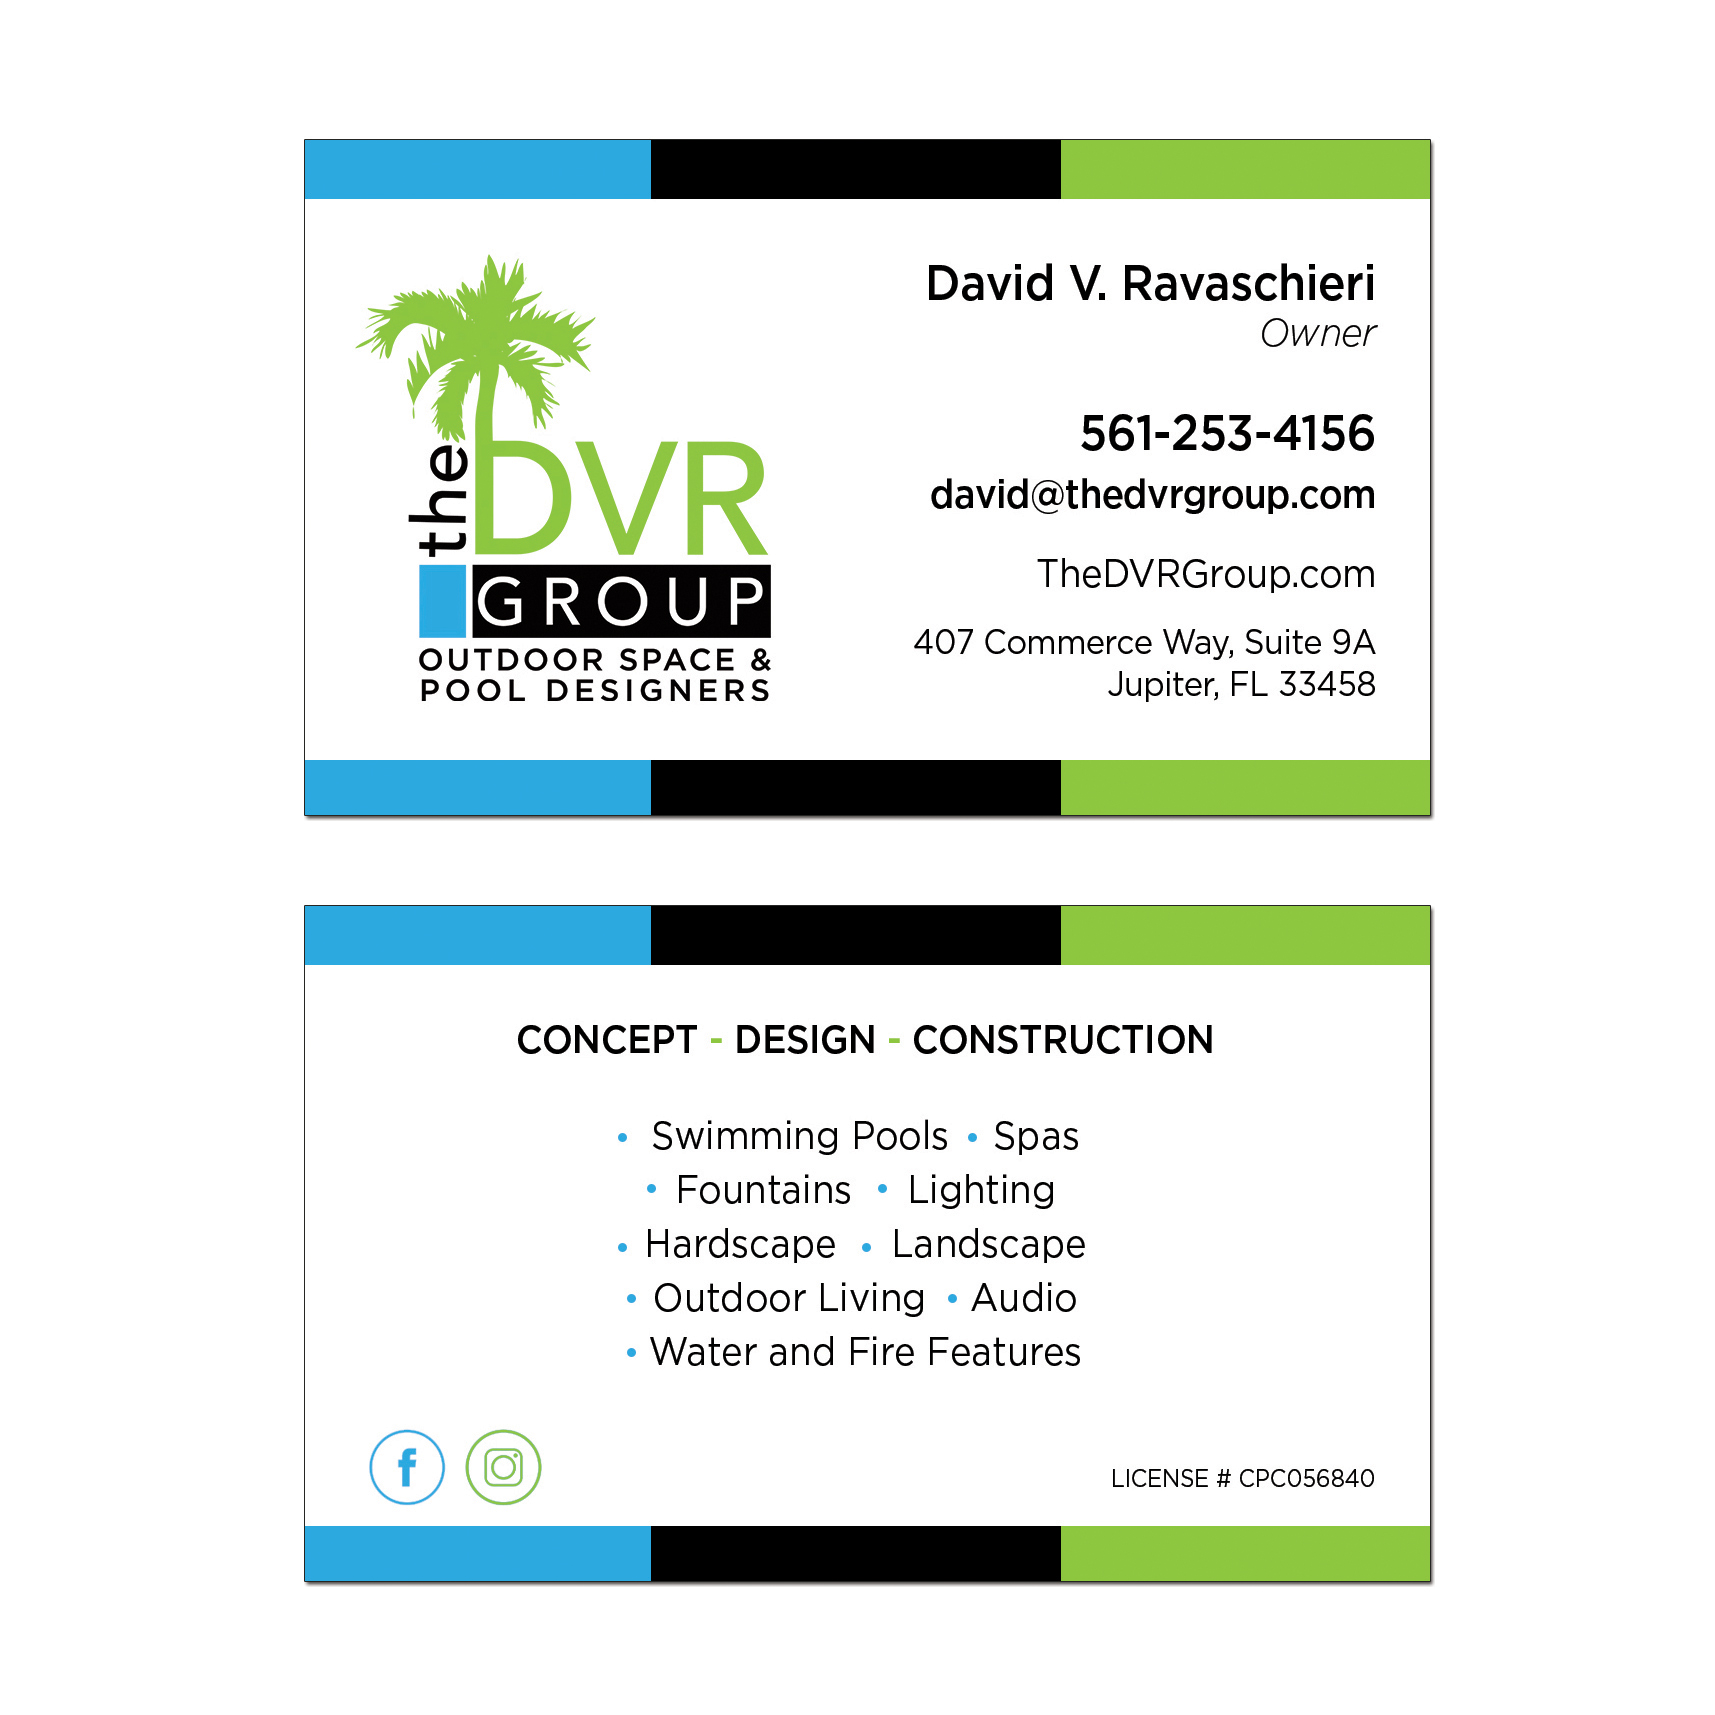 The DVR Group Business Card Design